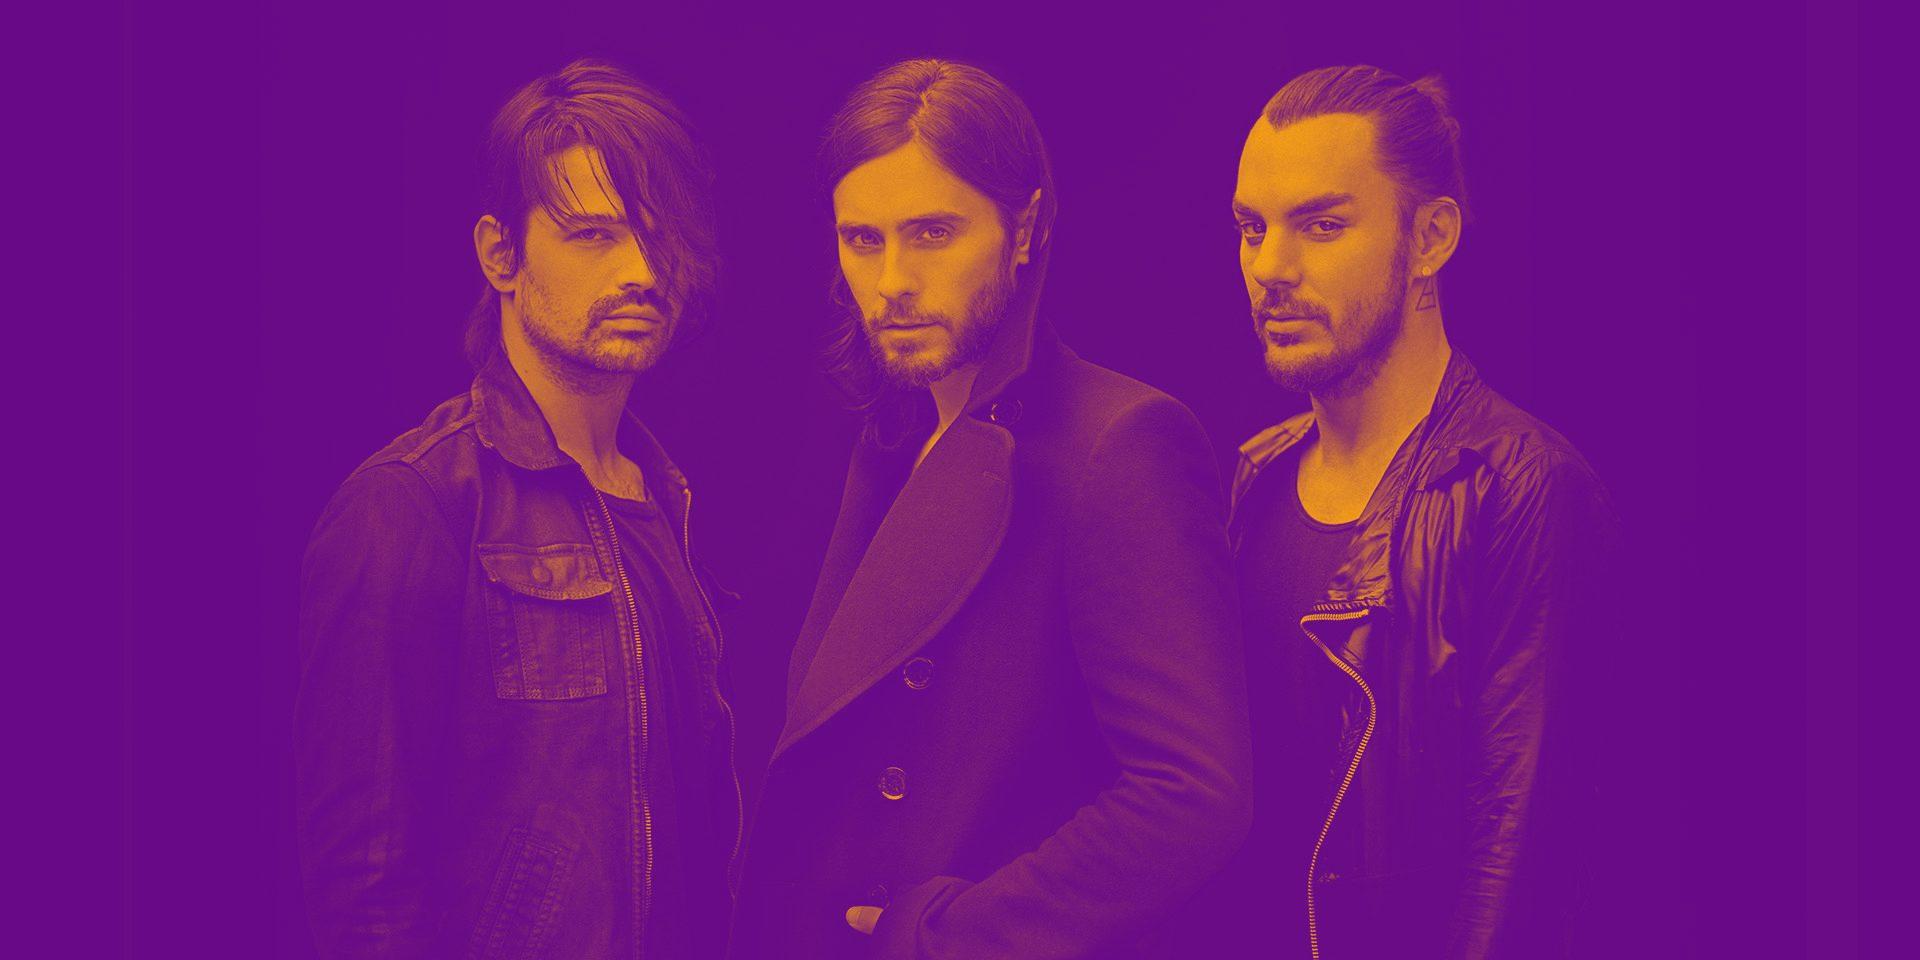 Тур на концерт 30 Seconds To Mars в Москву